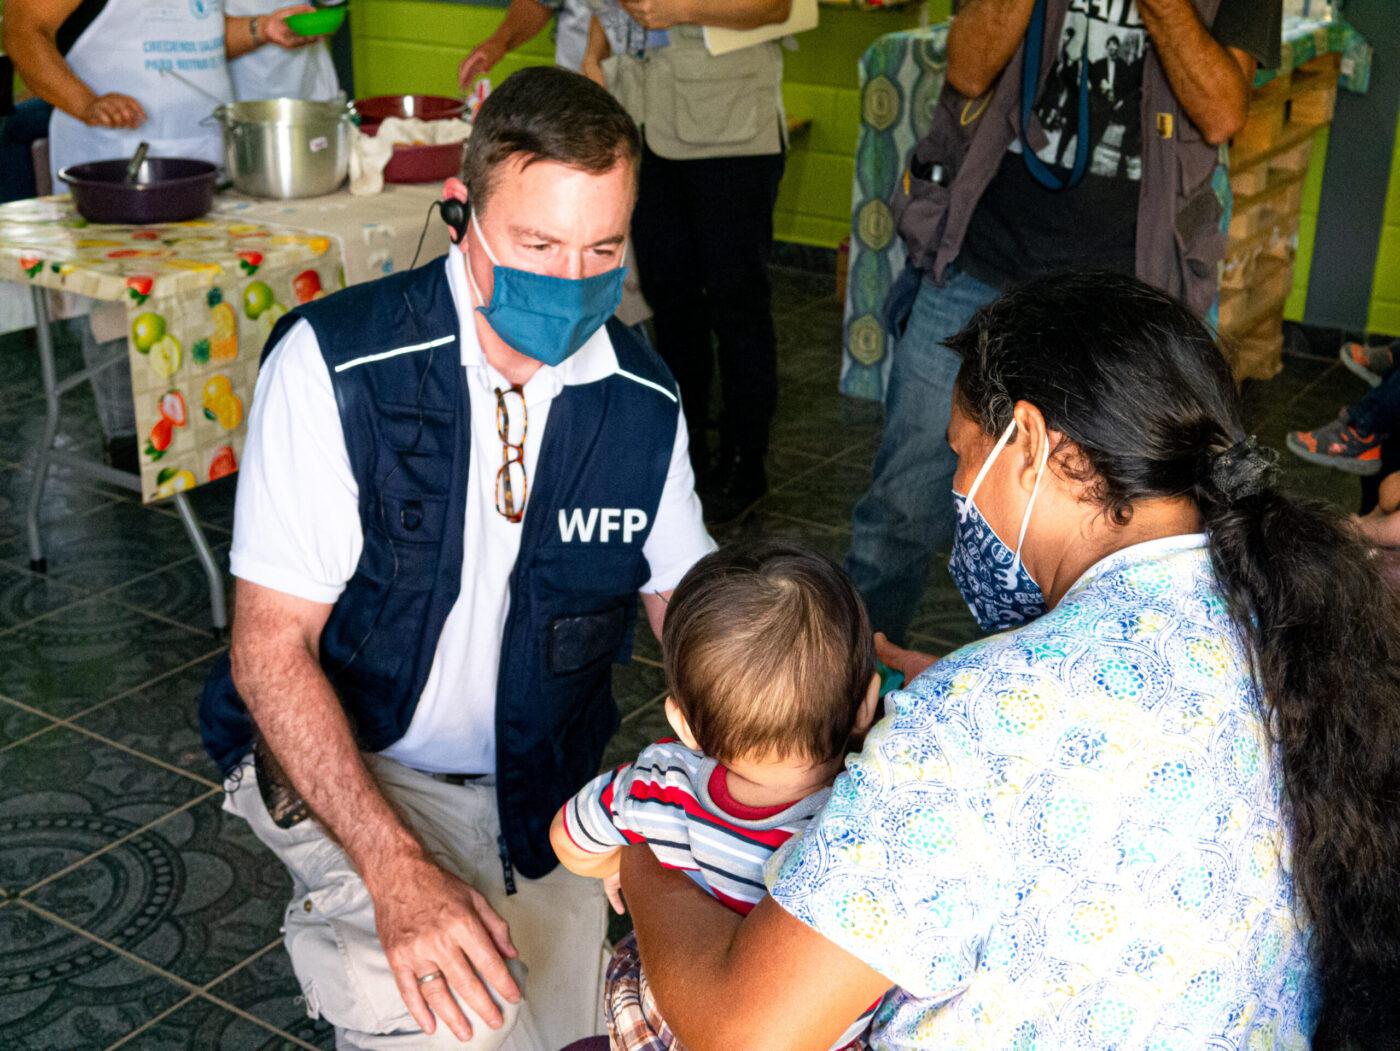 WFP USA President Barron Segar visits families in Central America